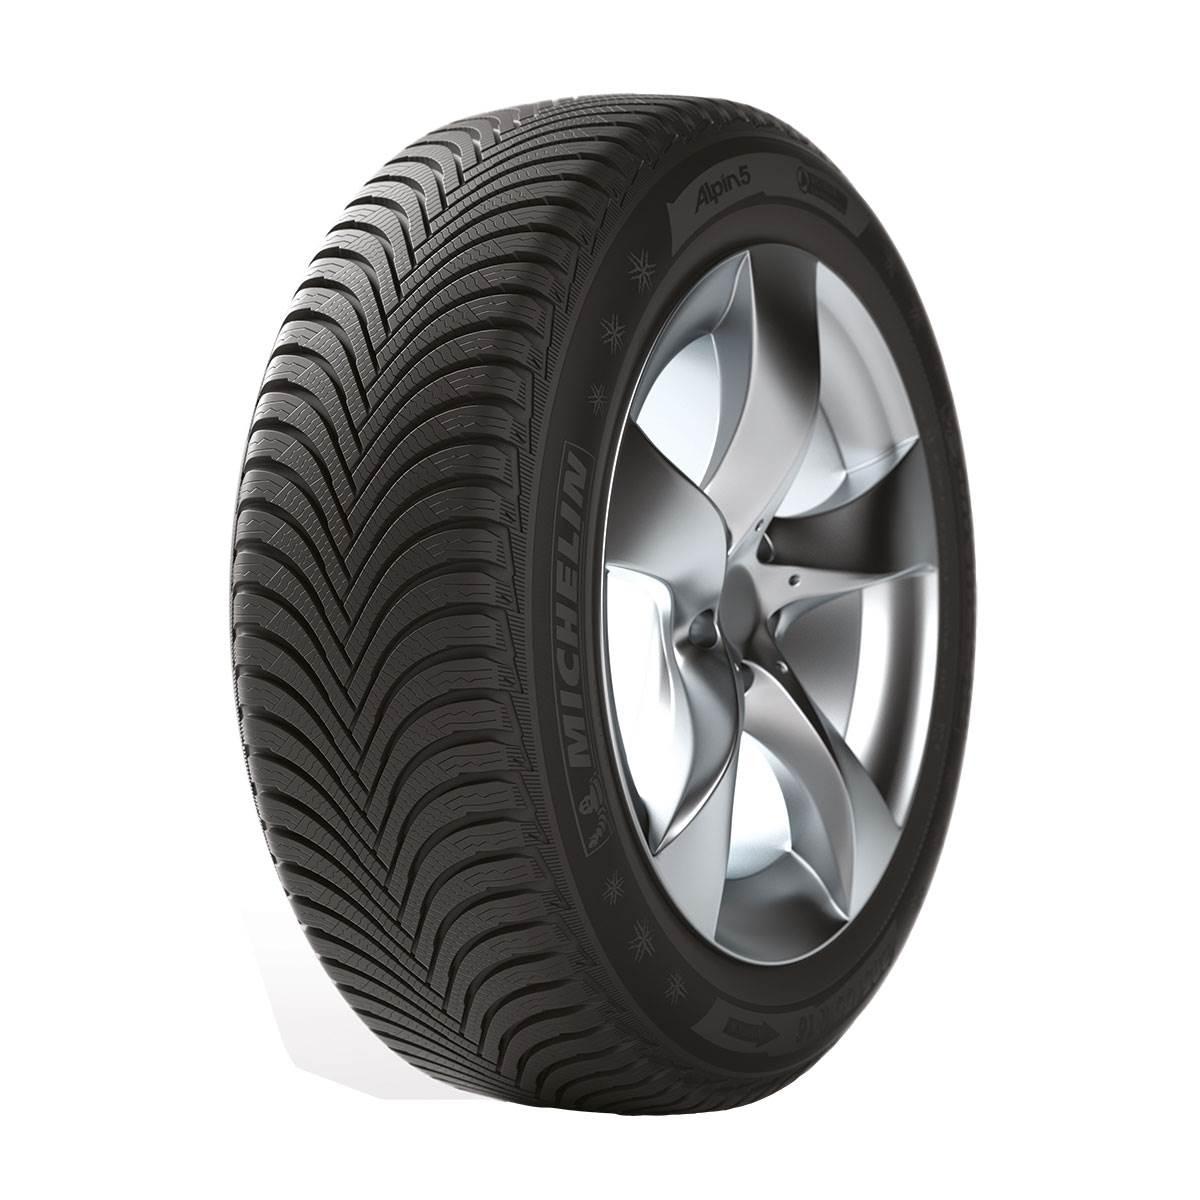 Pneu Hiver Michelin 225/60R16 102V Alpin A5 XL